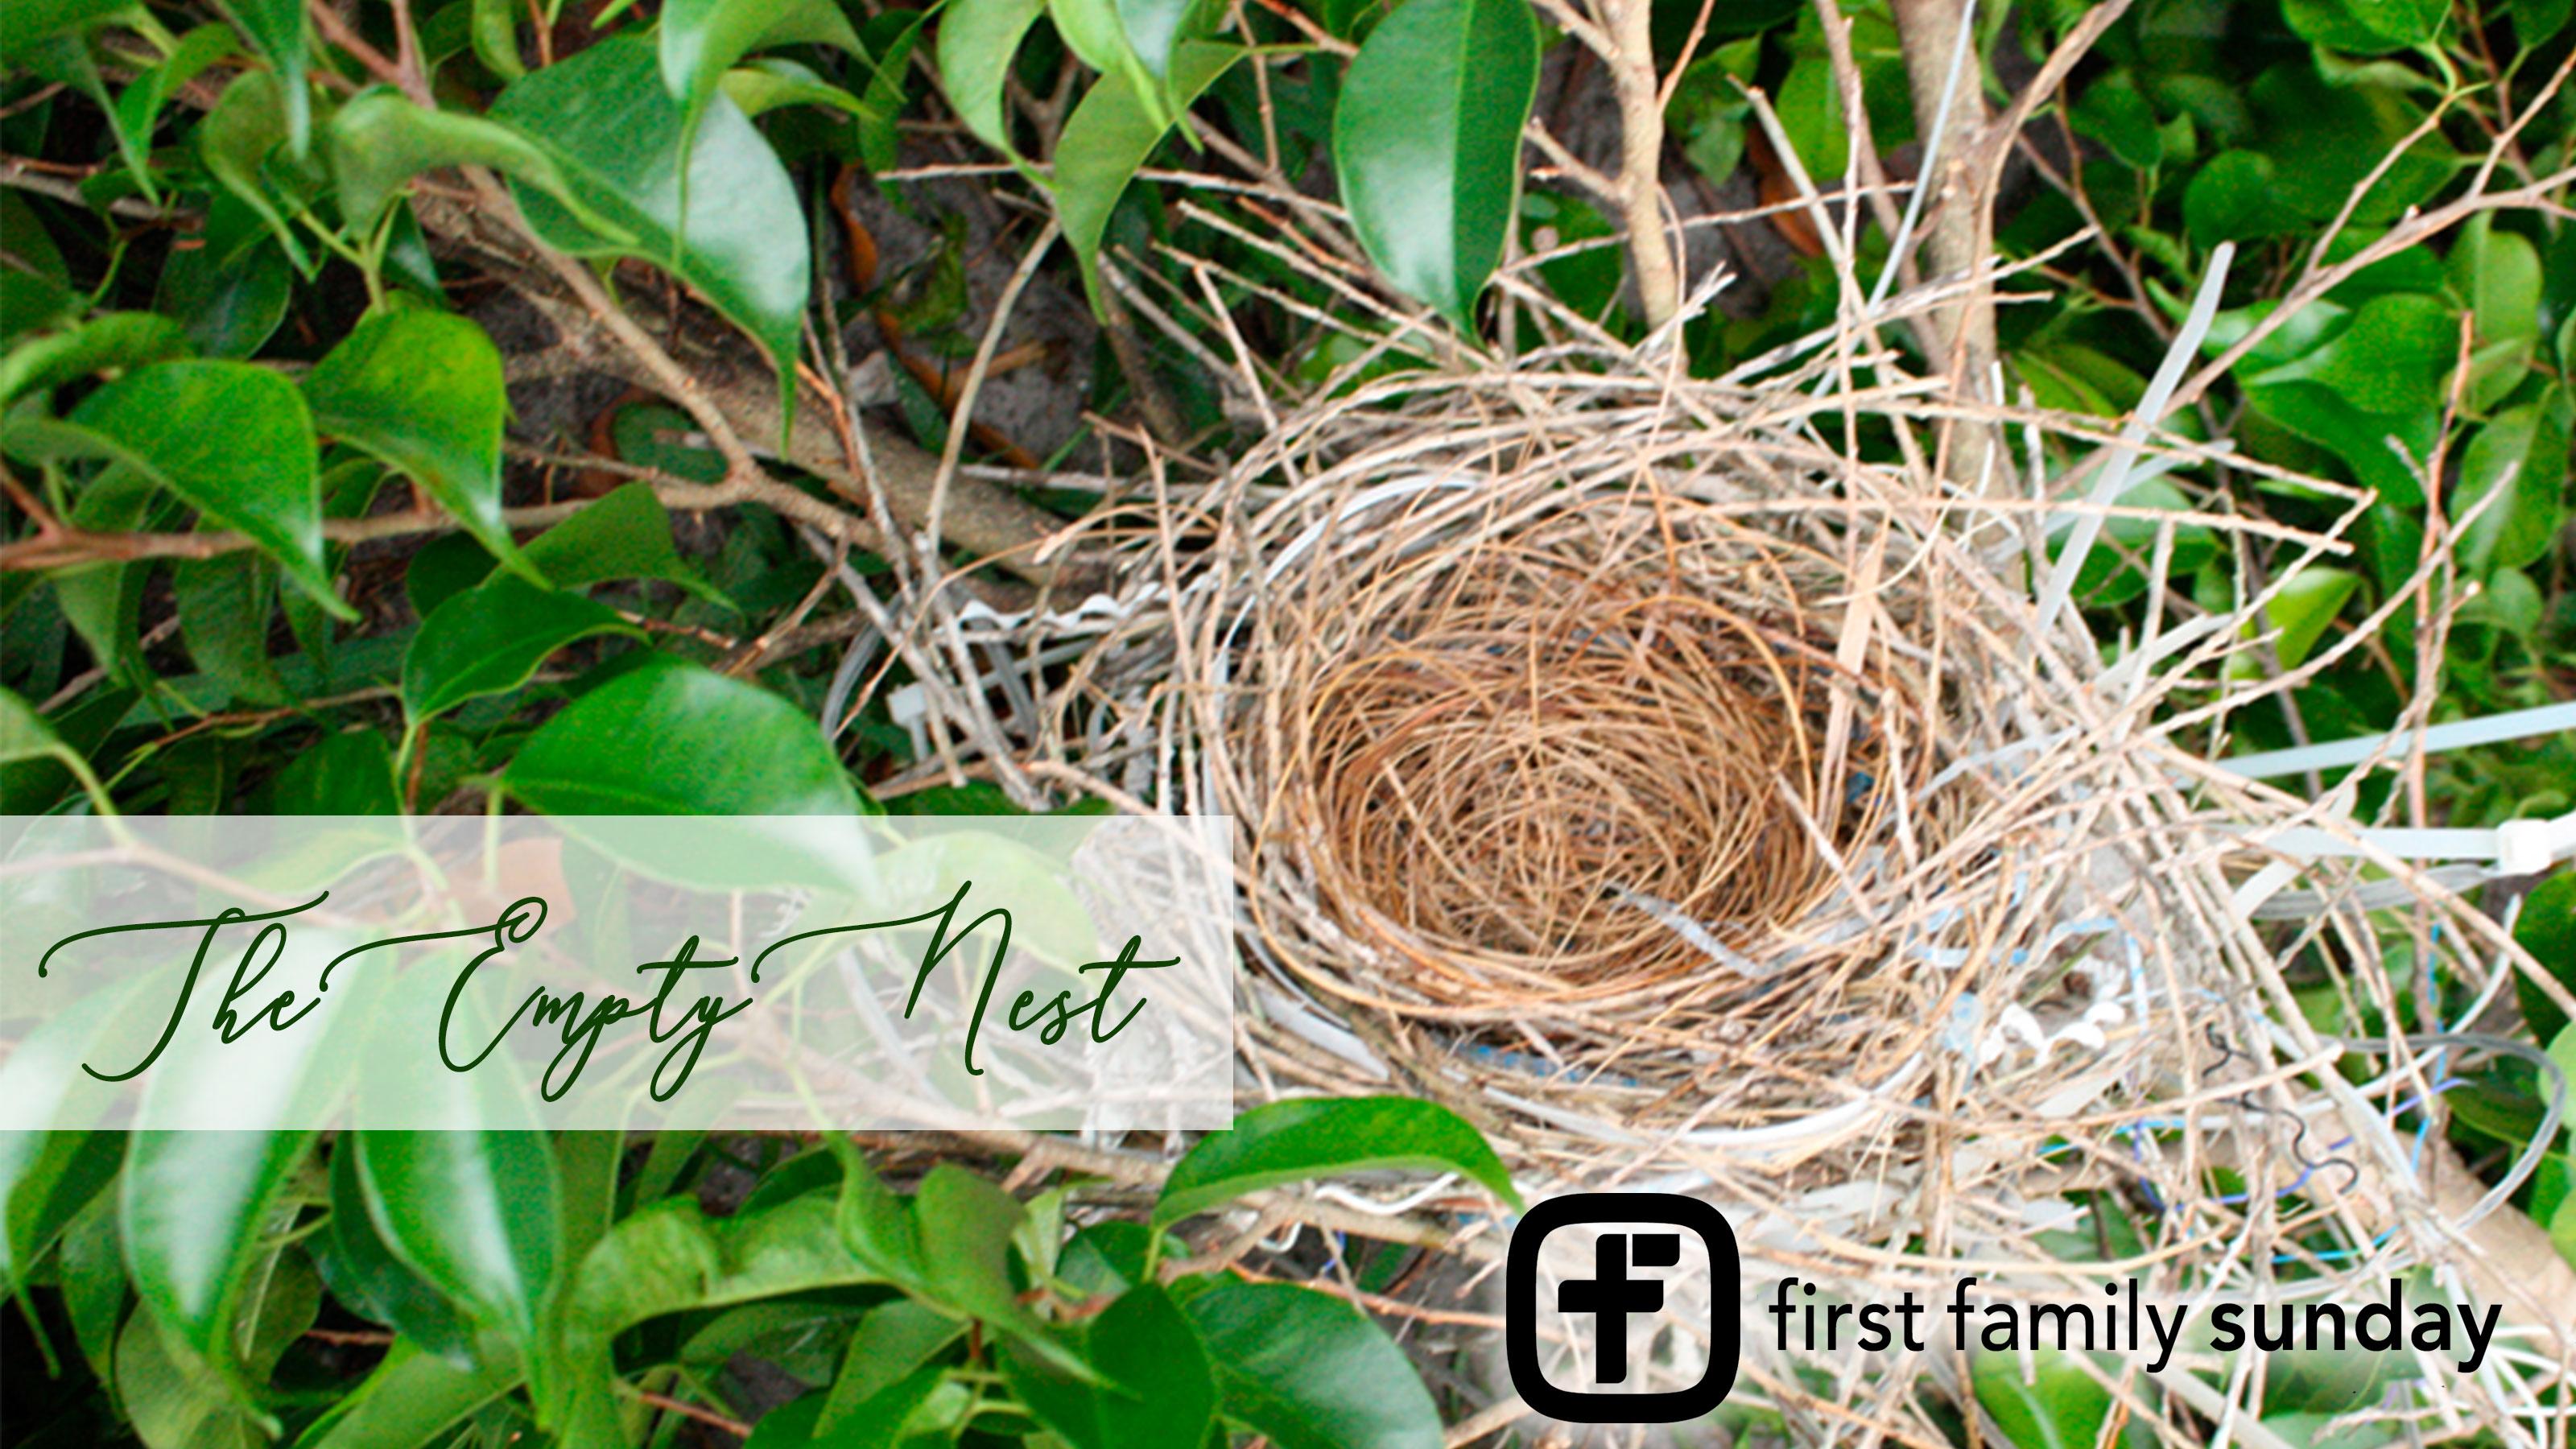 the-empty-nest-sermon-slie